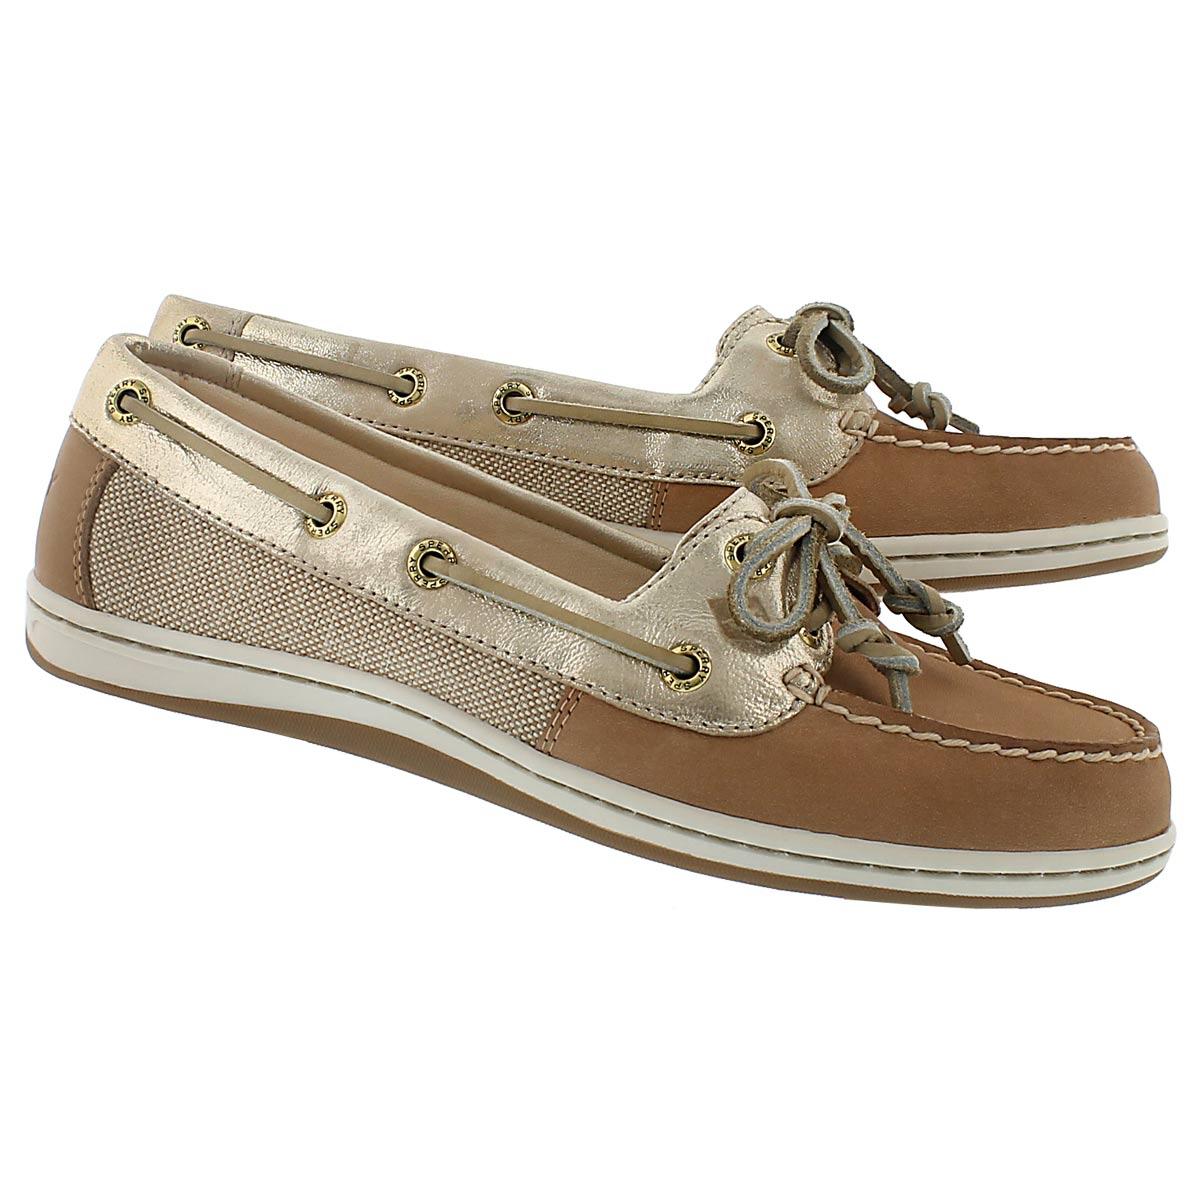 Lds Firefish linen/gold 2 Eye boat shoe